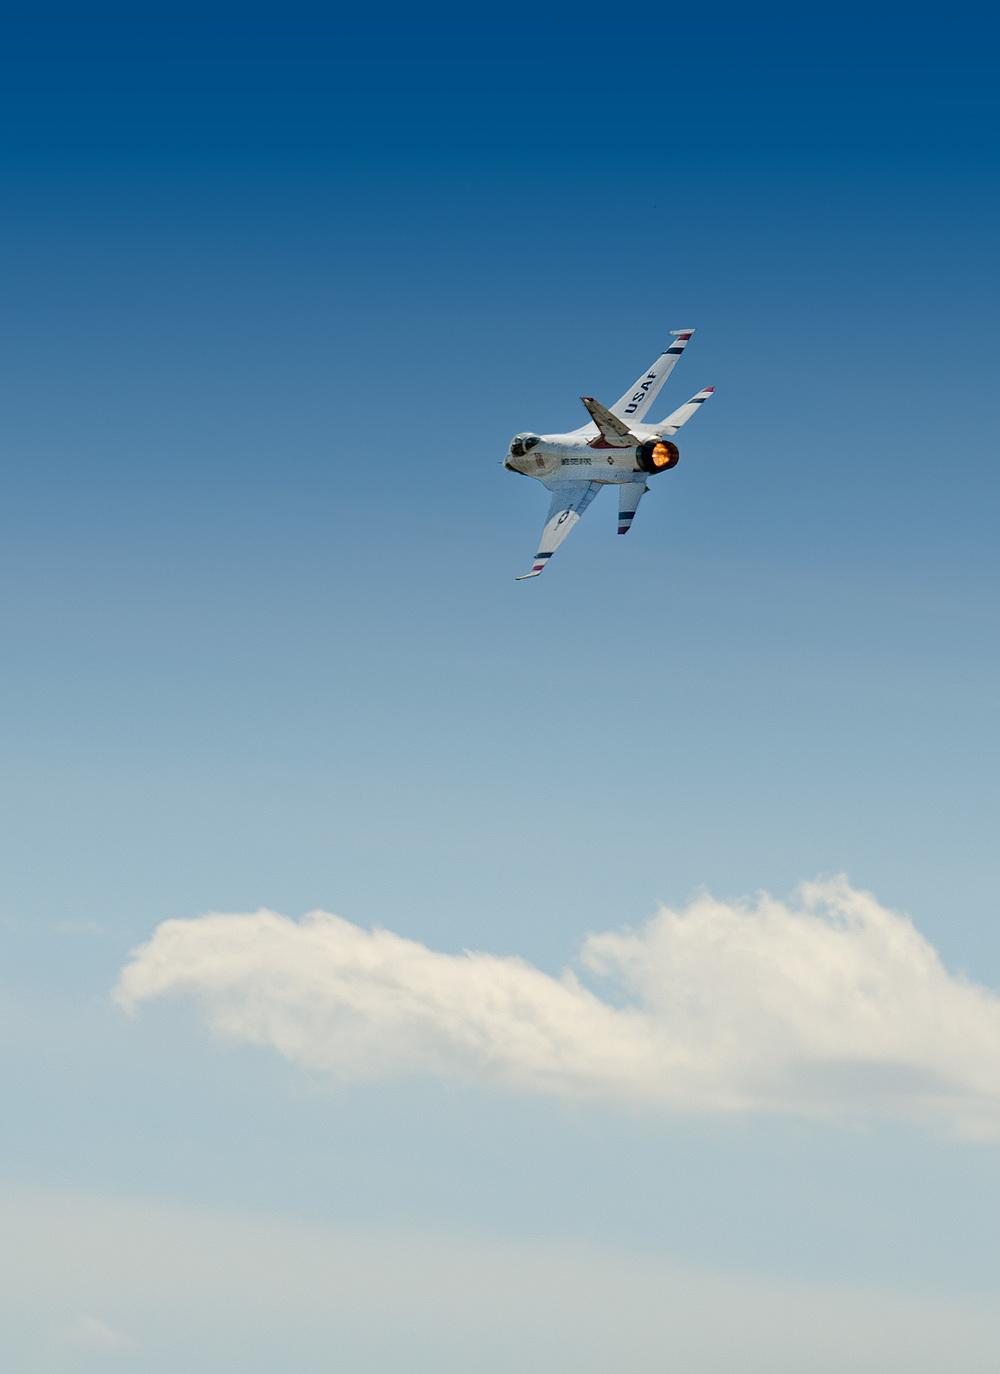 usaf-thunderbirds-bc-airshow-photography-afterburn